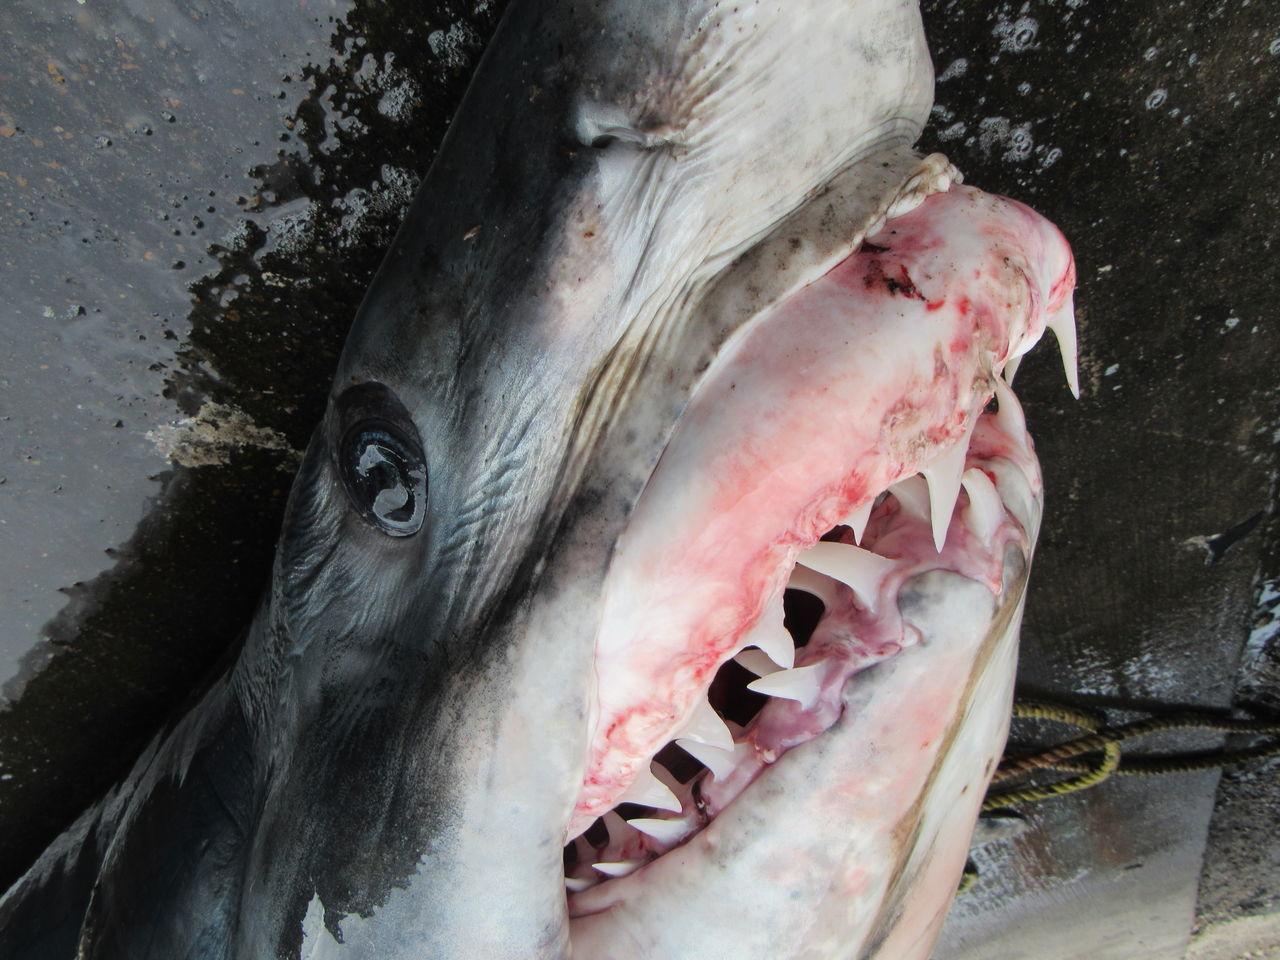 632 Pounds Animal Body Part Animal Eye Animal Head  Animal Skin Close-up Large Mammal Mako Shark Marine Life Outdoors Razor Teeth Research And Development Sand Paper Skin Premium Collection